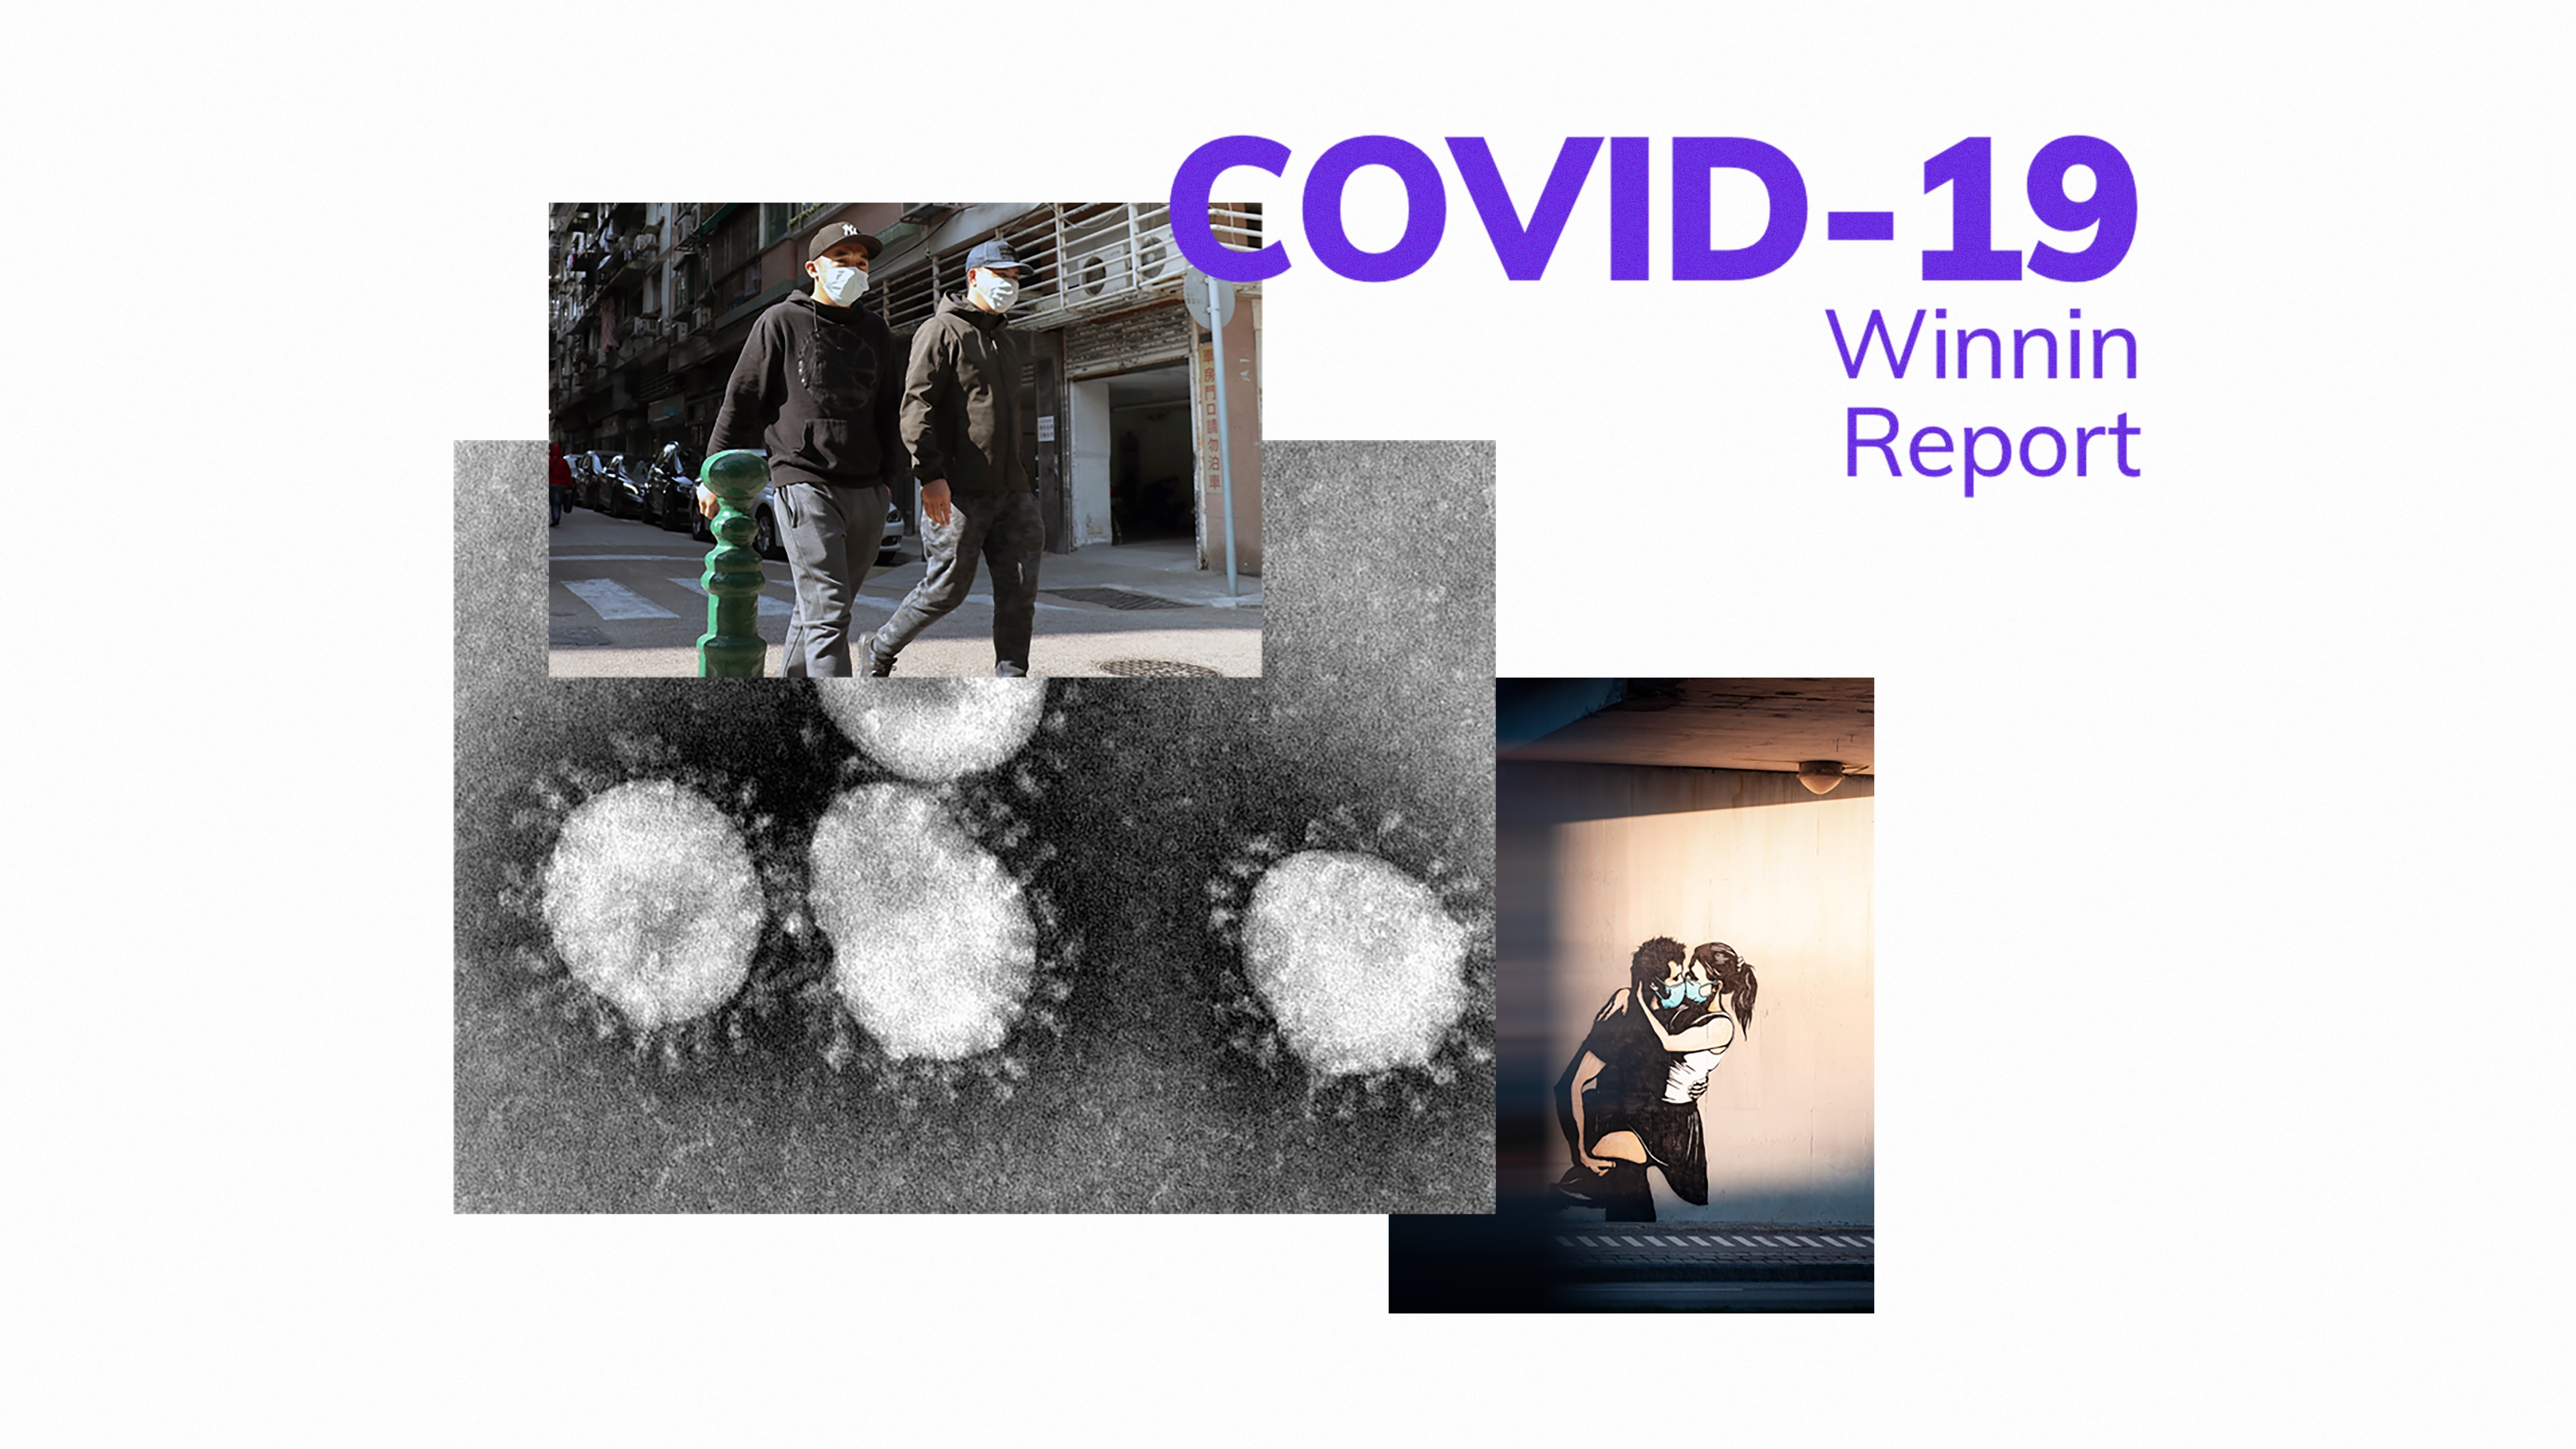 covid-19 winnin report